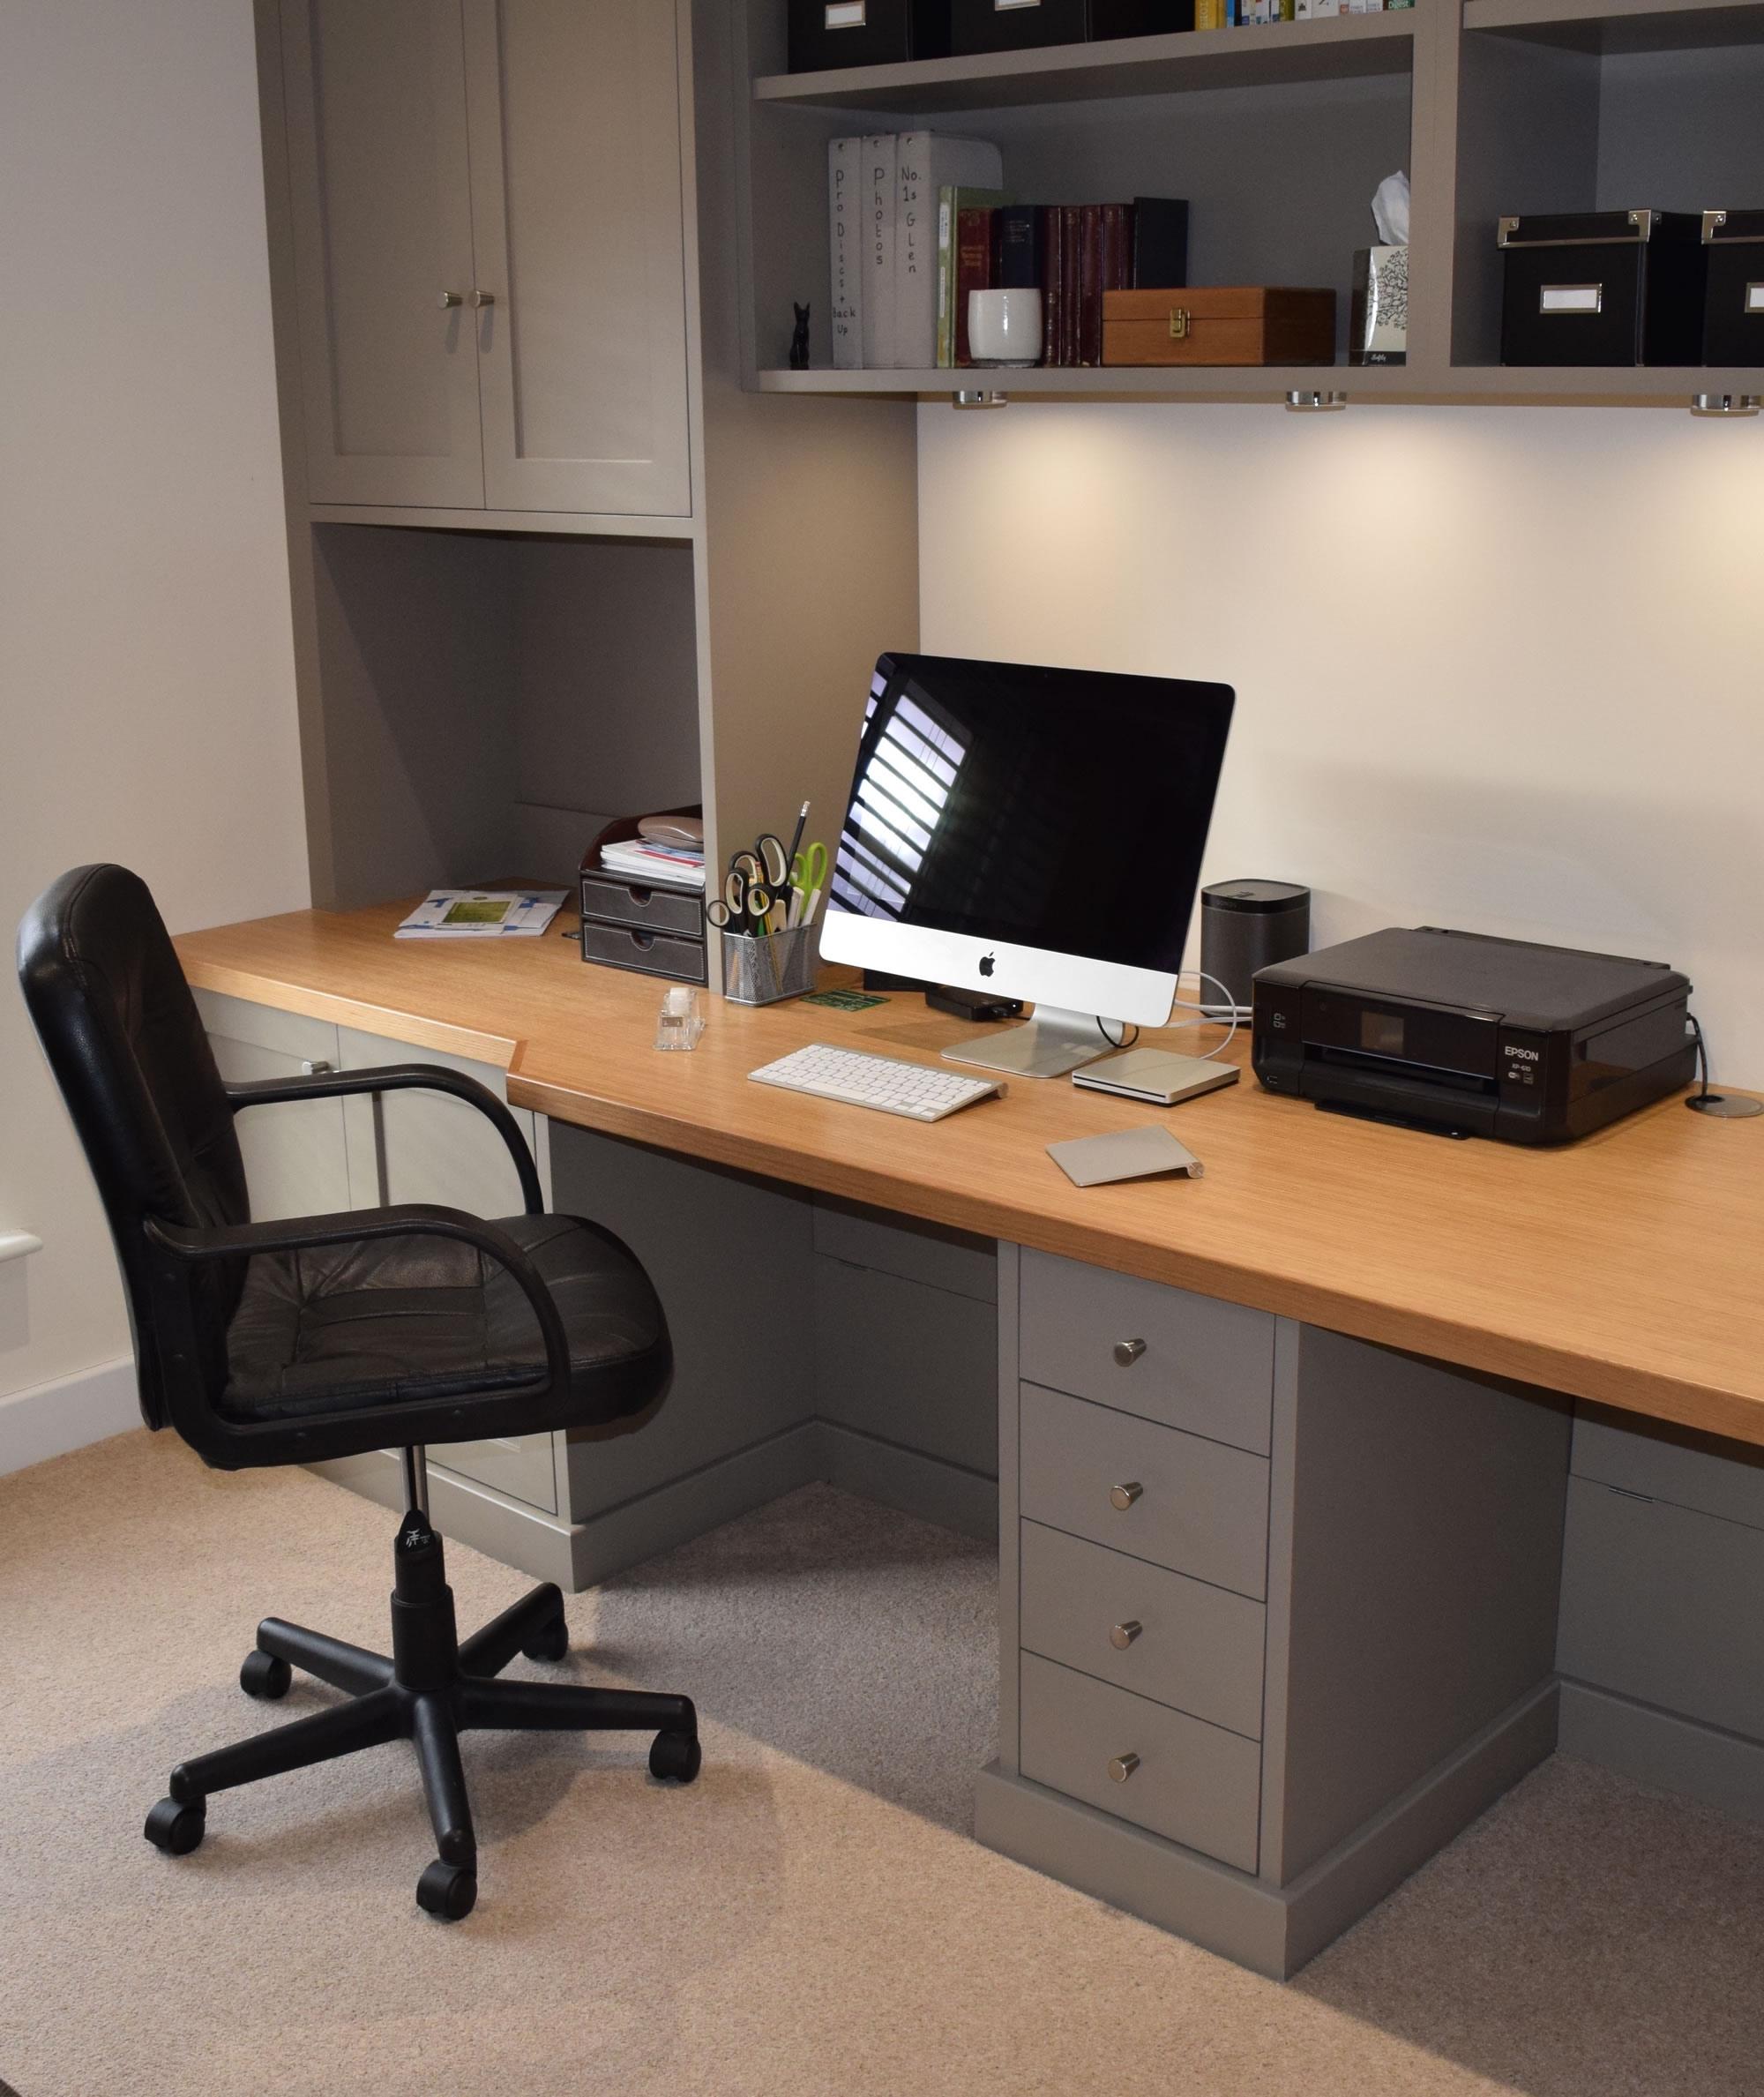 Bespoke Study Furniture Gallery Within Bespoke Study Furniture (#5 of 15)